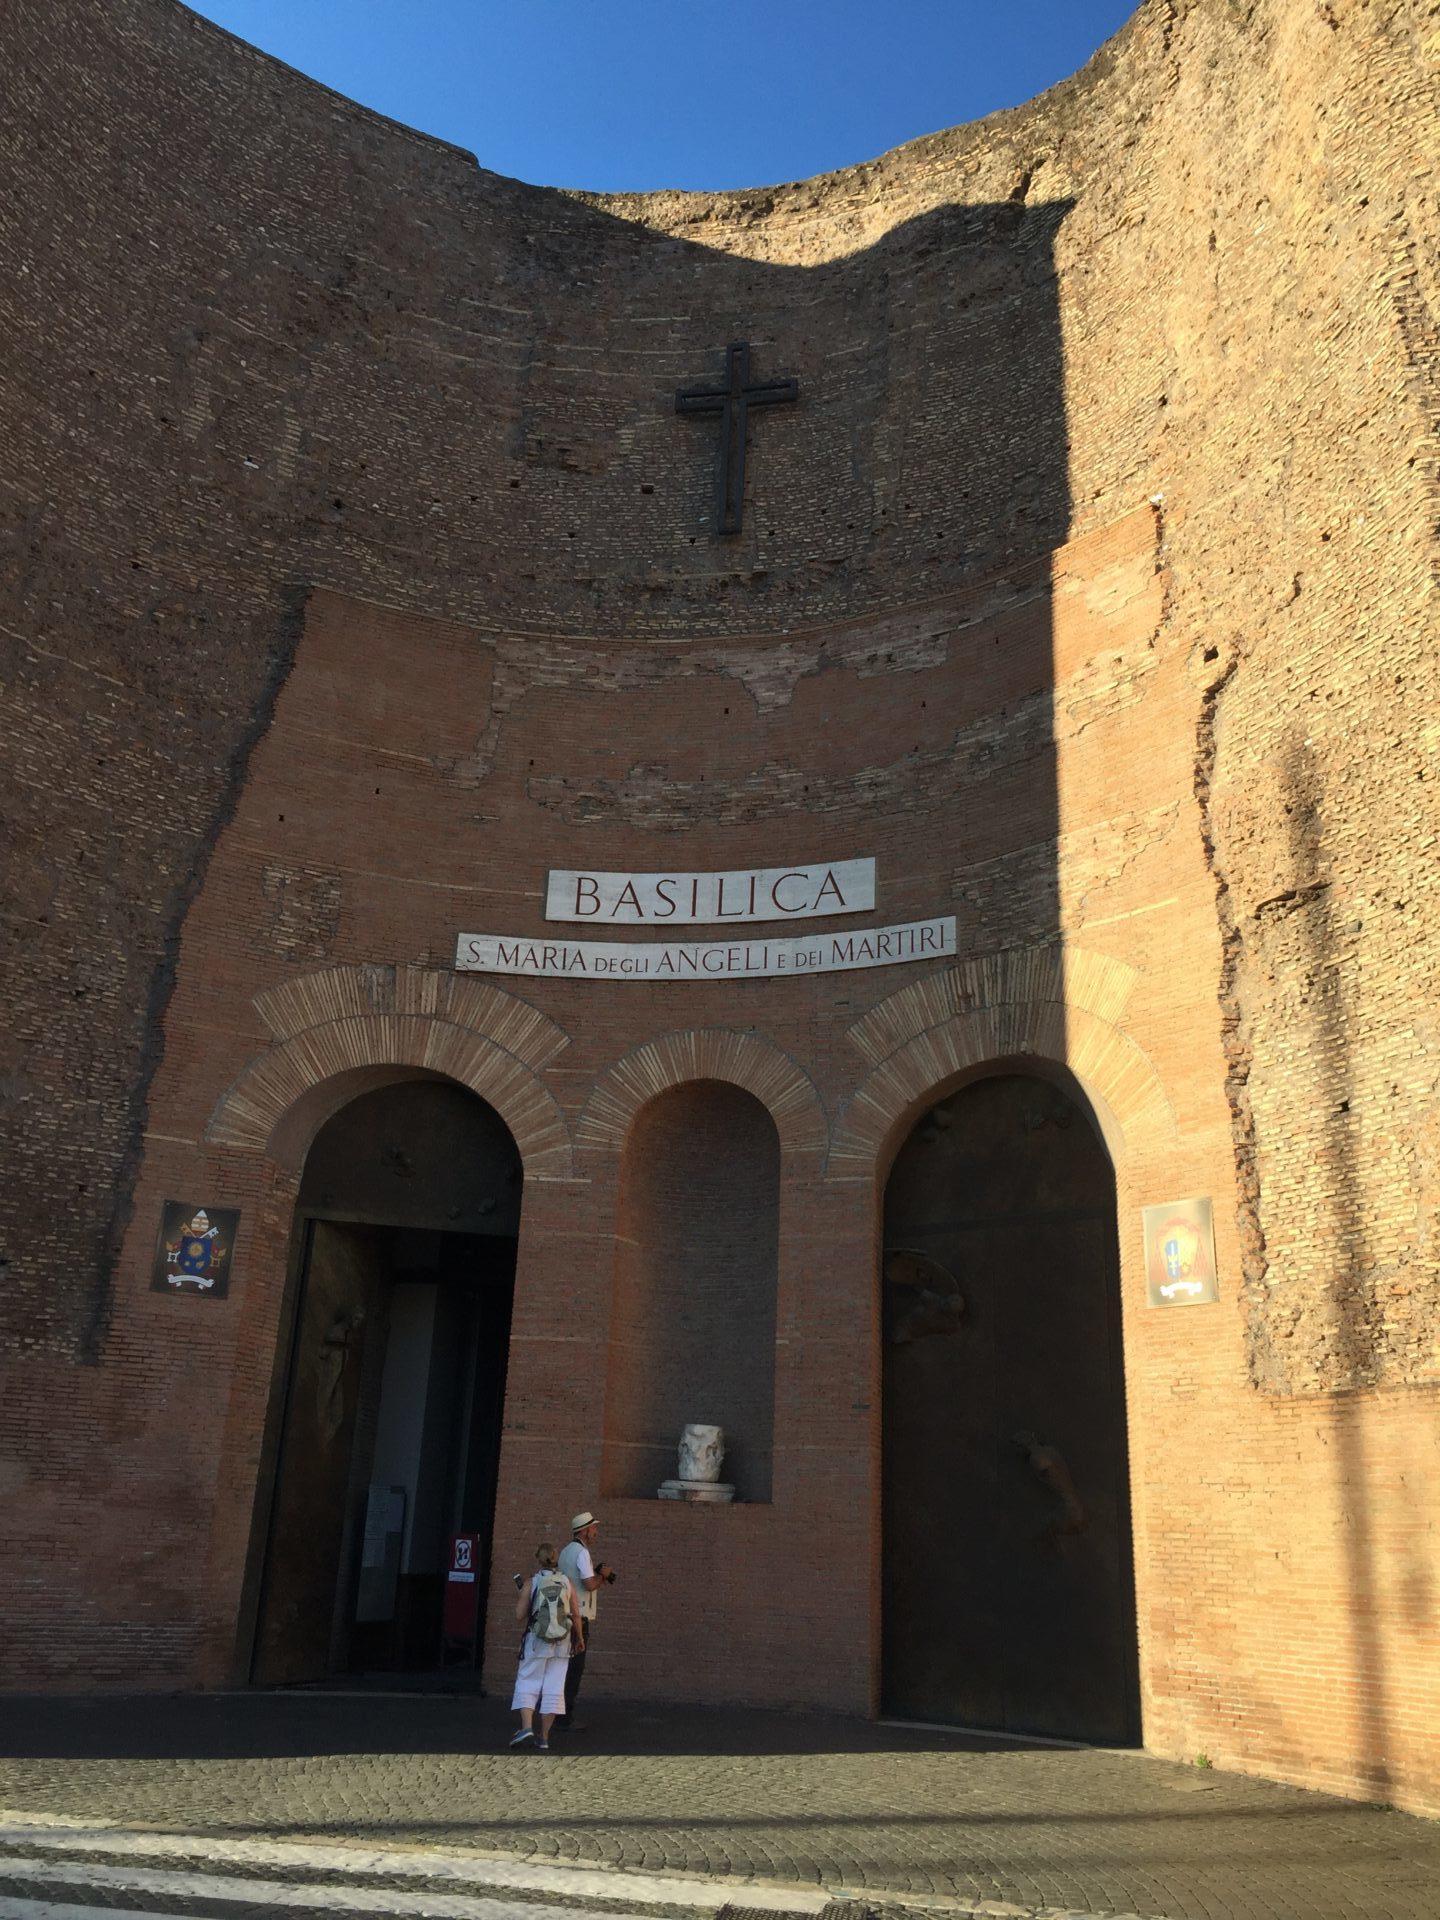 "<img src=""http://marenostrum.pl/wp-content/uploads//2019/11/Santa-Maria-degli-Angeli-et-Martiri.jpg"" alt=""Kościół Santa Maria degli Angeli et Martiri"" />"